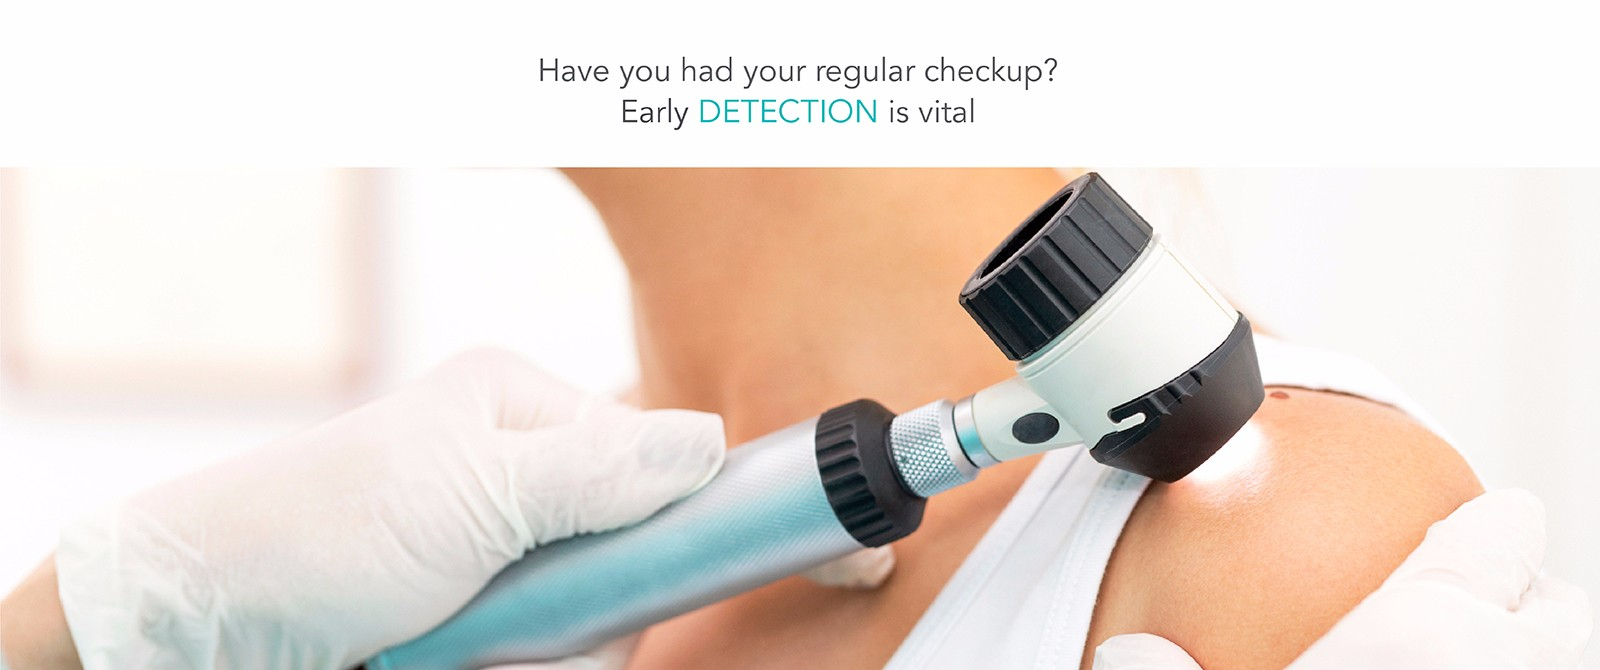 Dermatoscope Skin Checkup